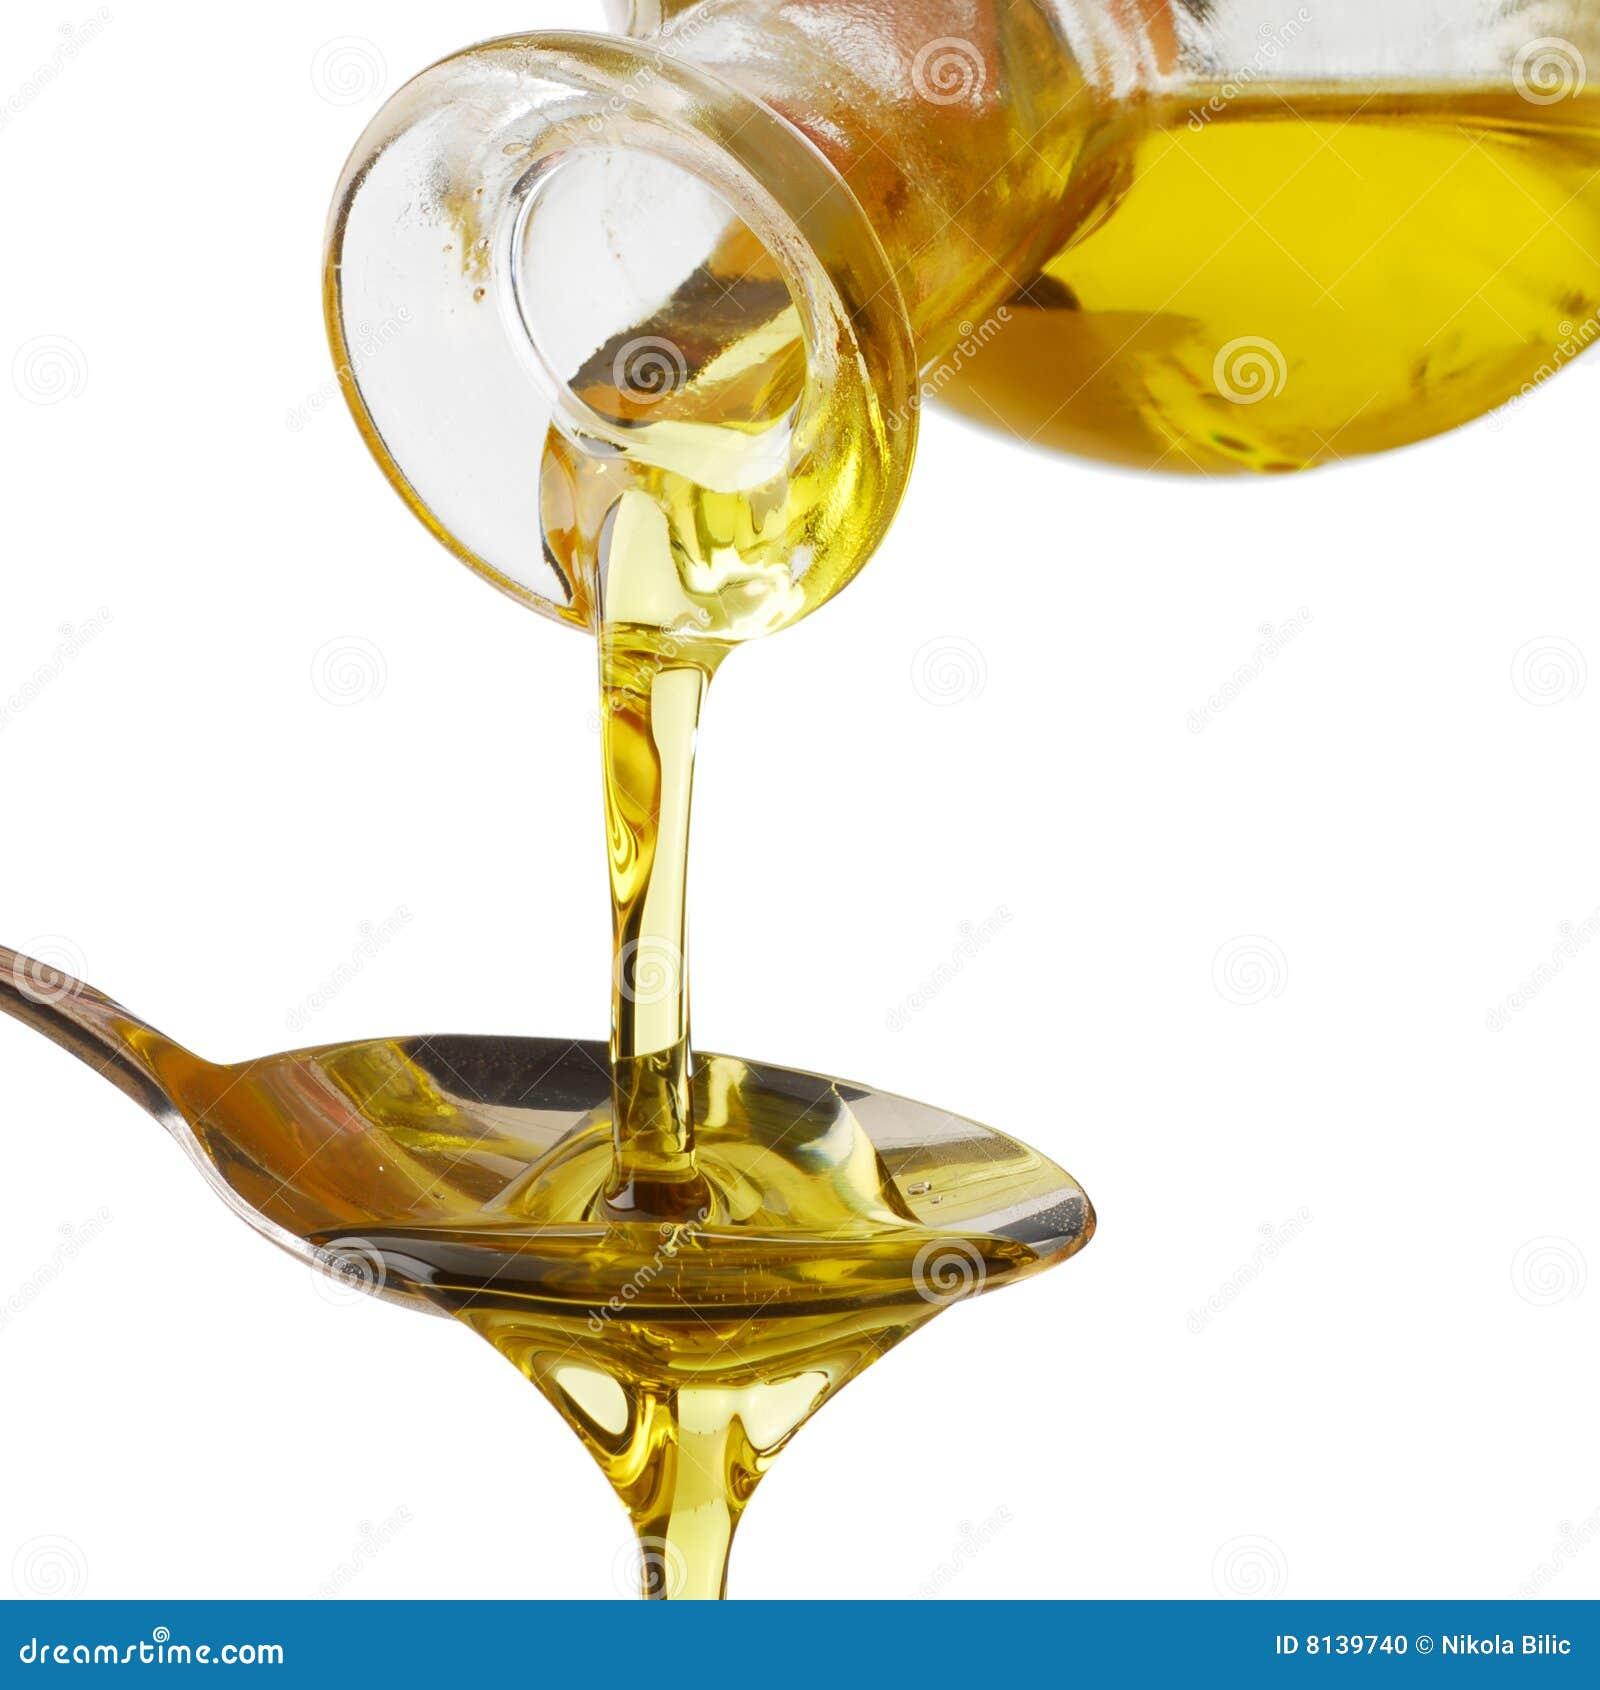 olive oil business plan pdf